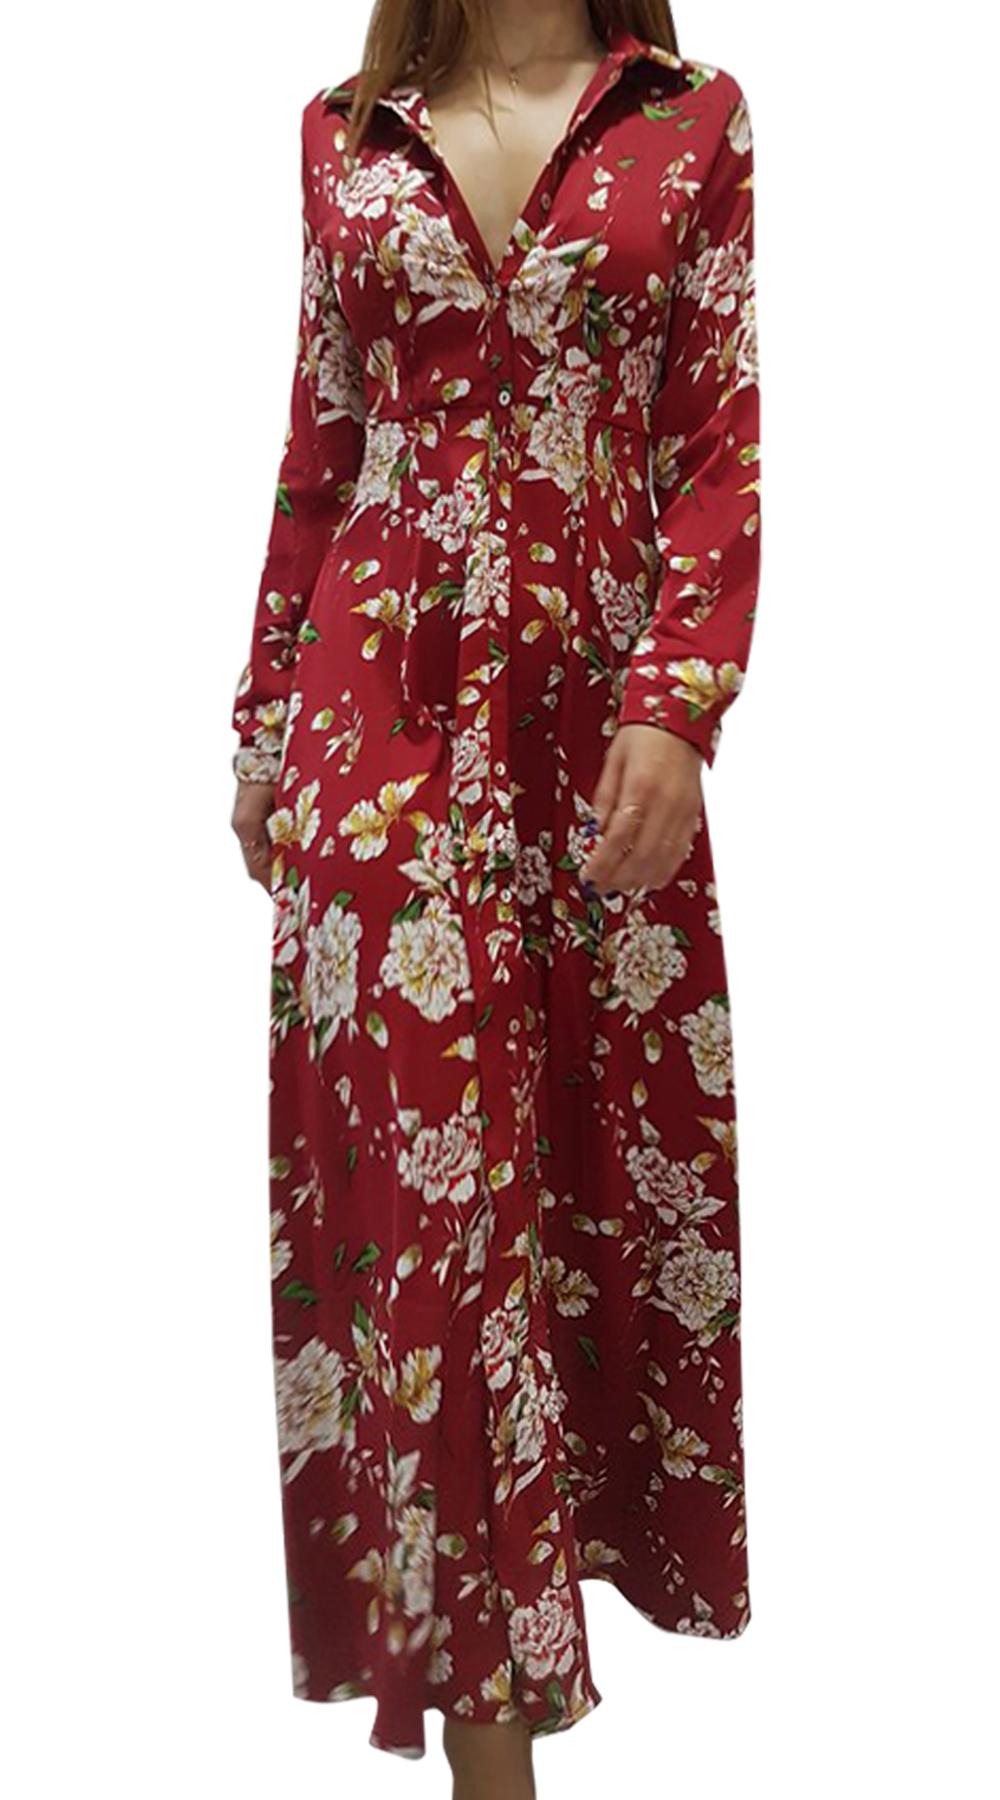 Maxi σατινέ φόρεμα παστέλ φλοράλ - OEM - W18SOF-588299101 φορέματα φλοράλ φορέματα